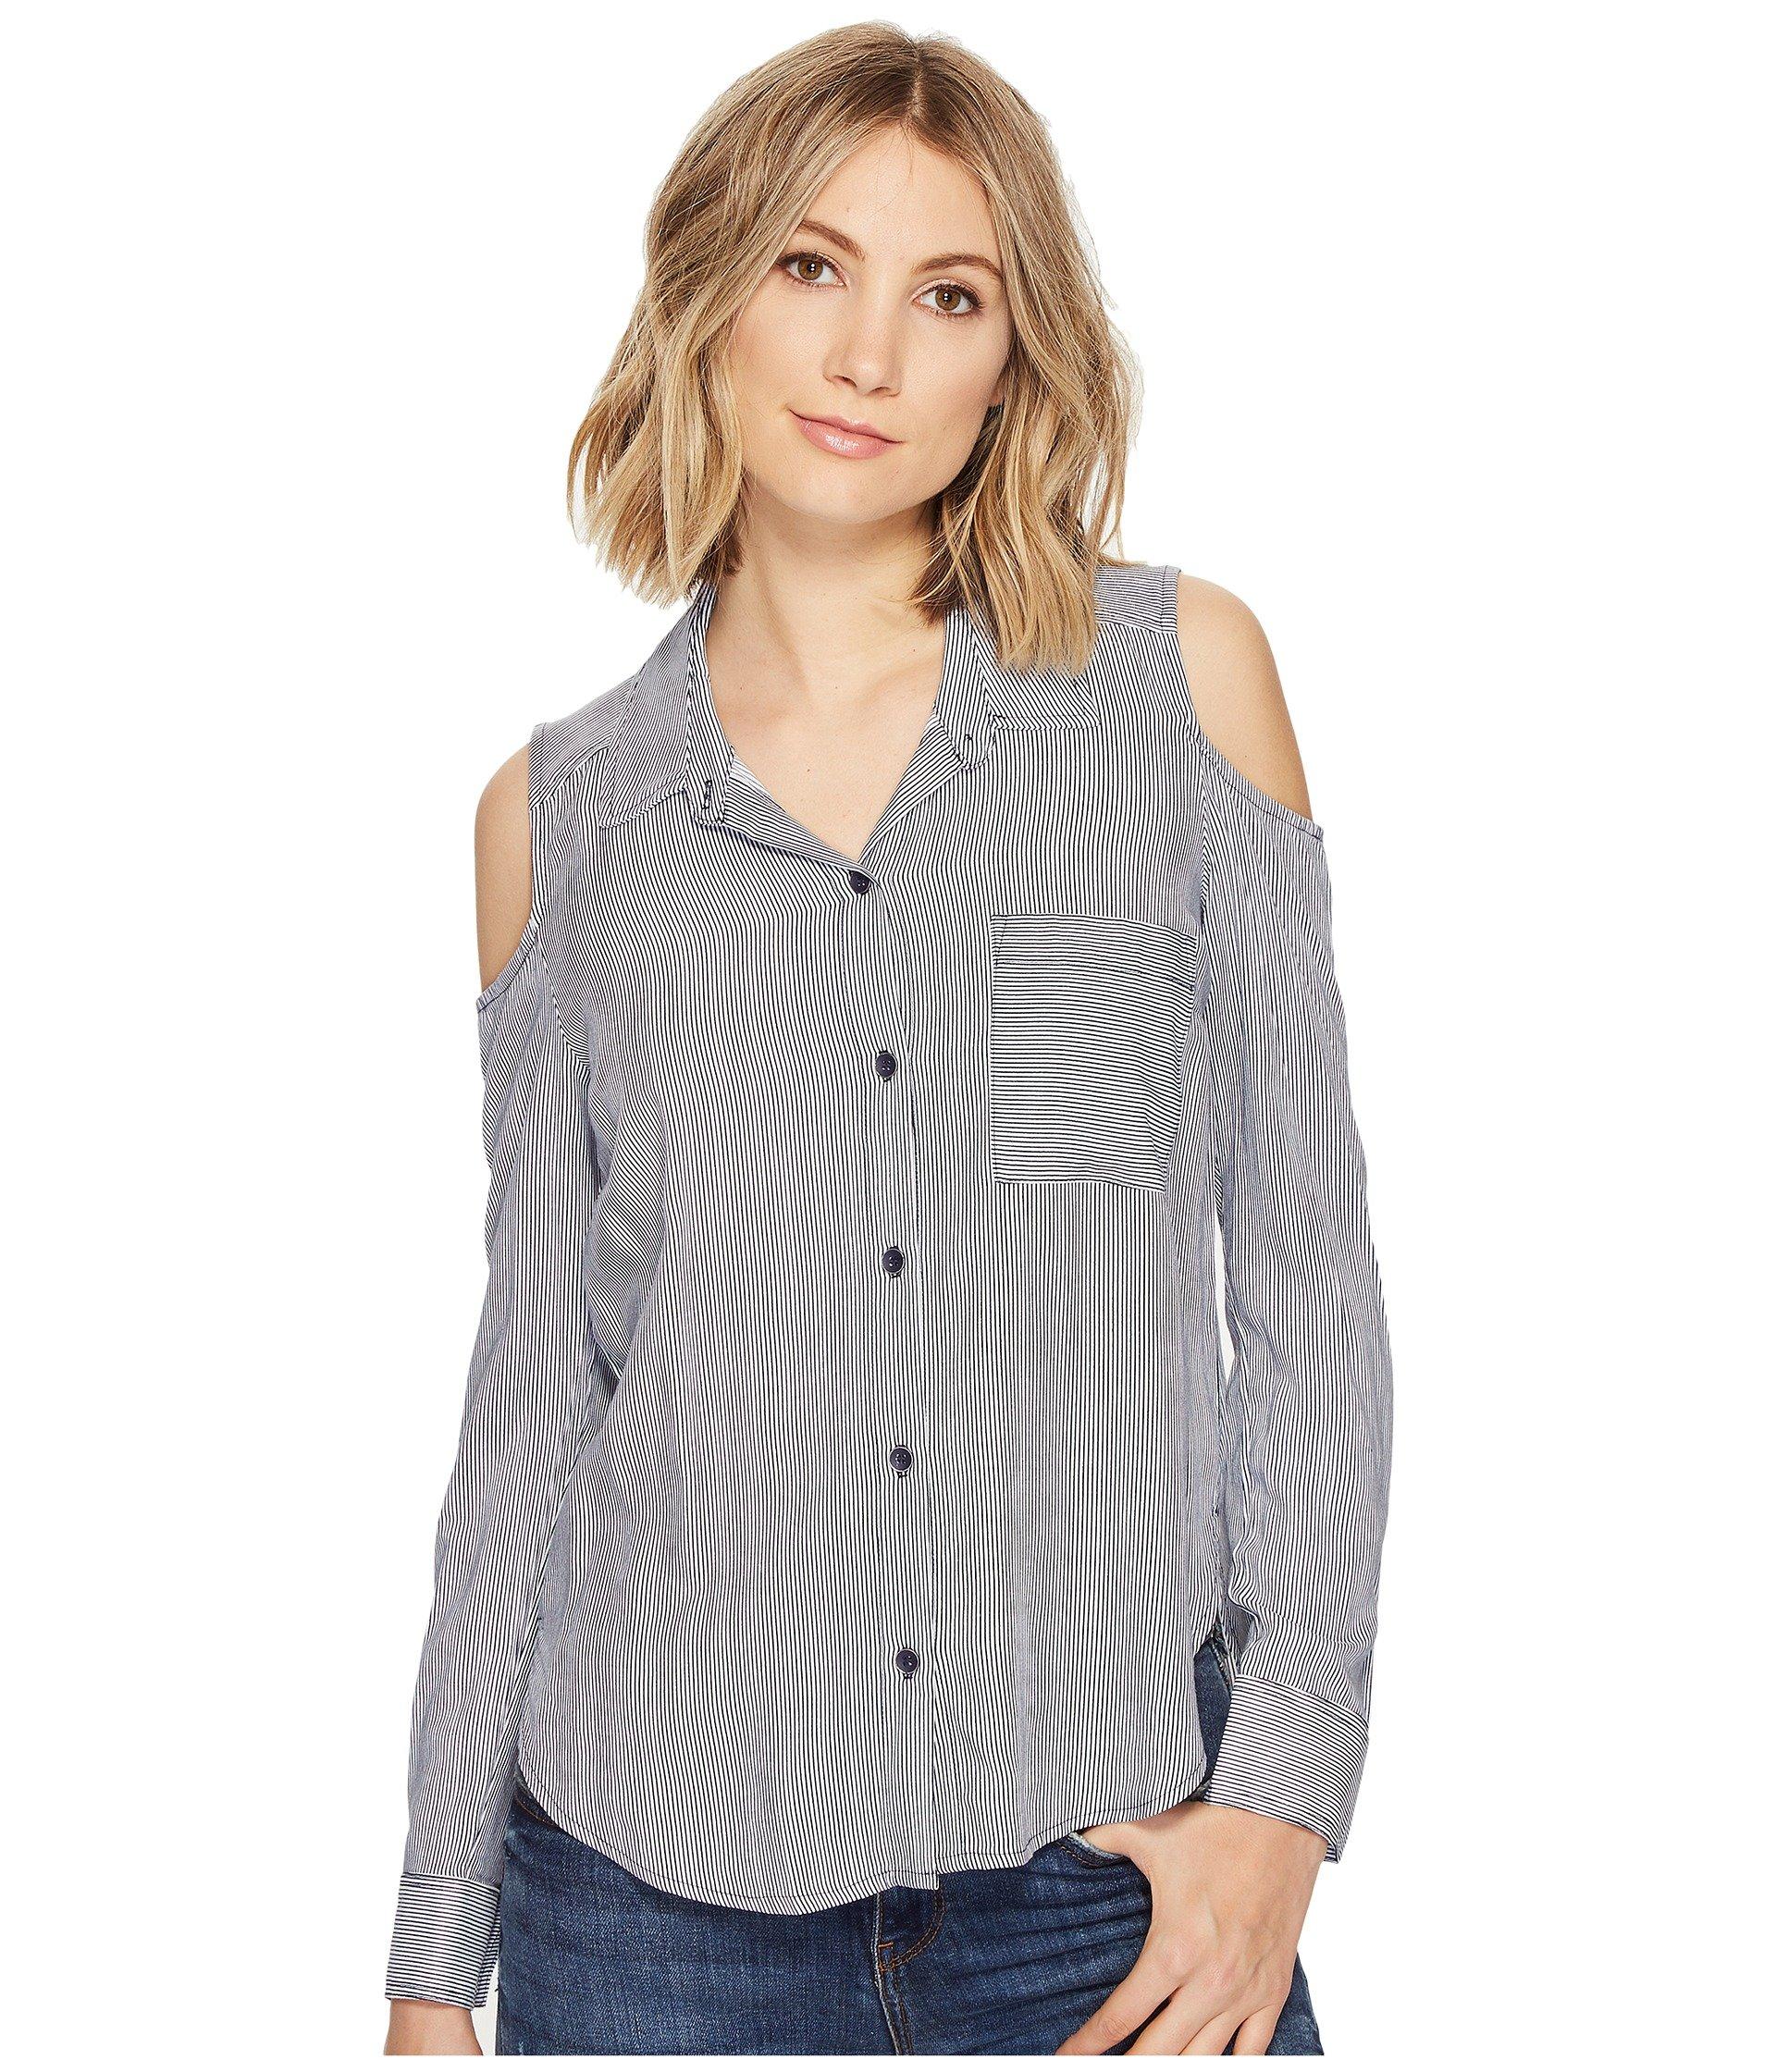 Boardwalk Stripe Mixed Stripe Shirt